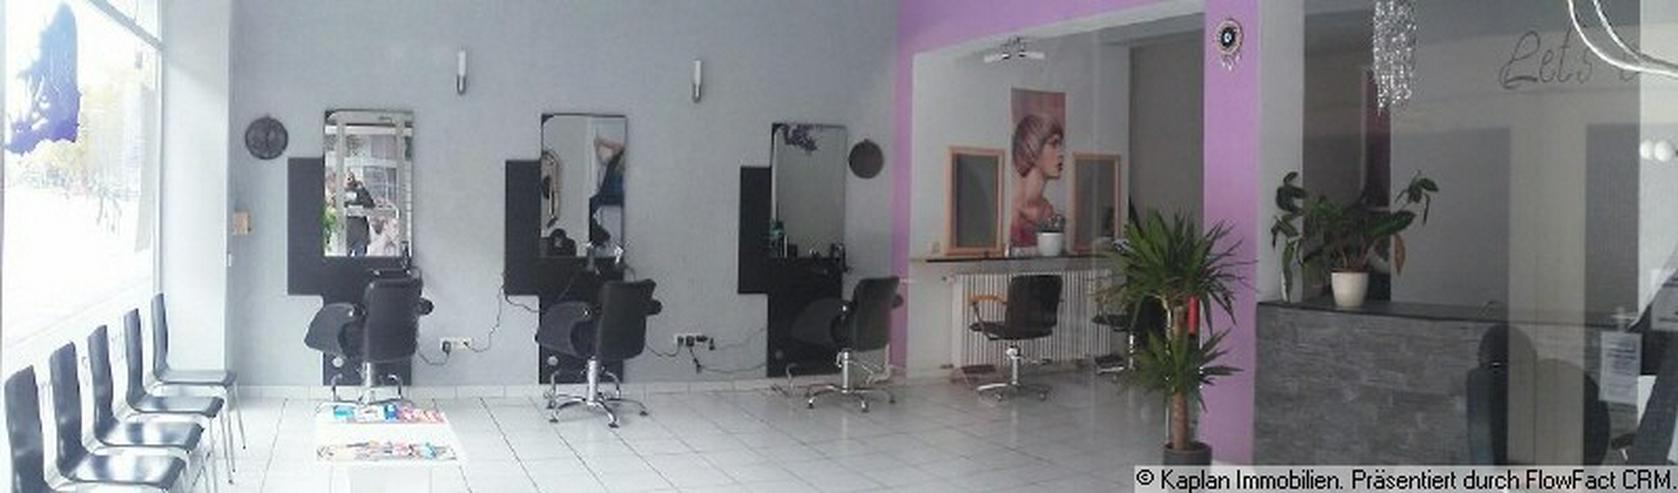 Bild 2: Friseursalon sucht neuen Mieter *PROVISIONSFREI !!!